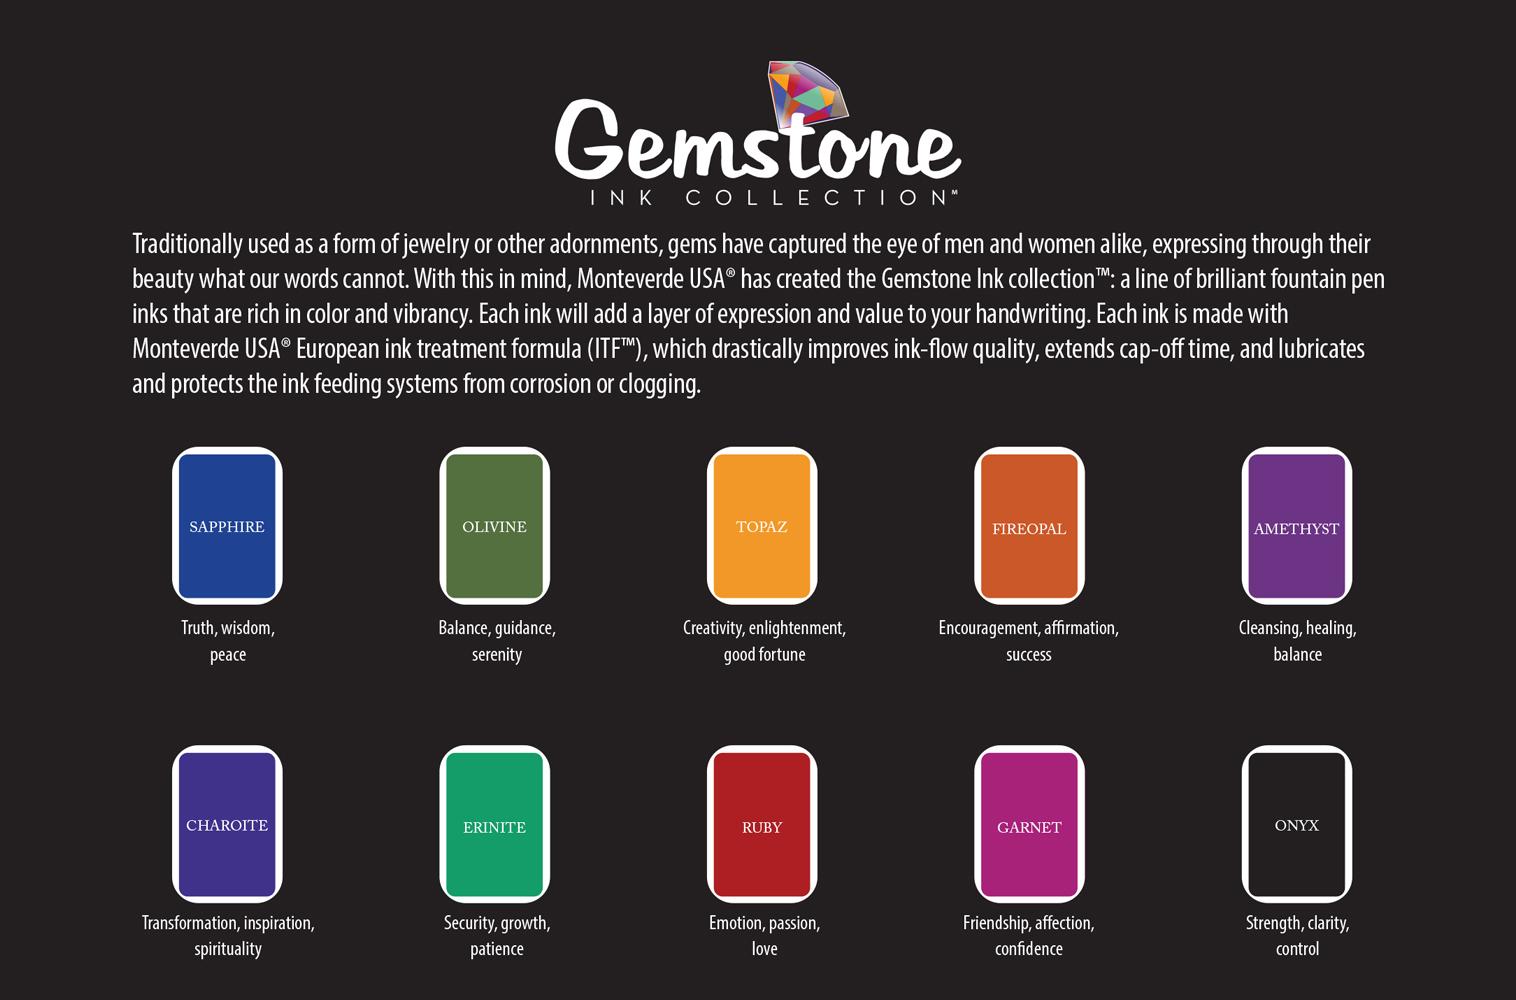 gemstone-banner-new.jpg